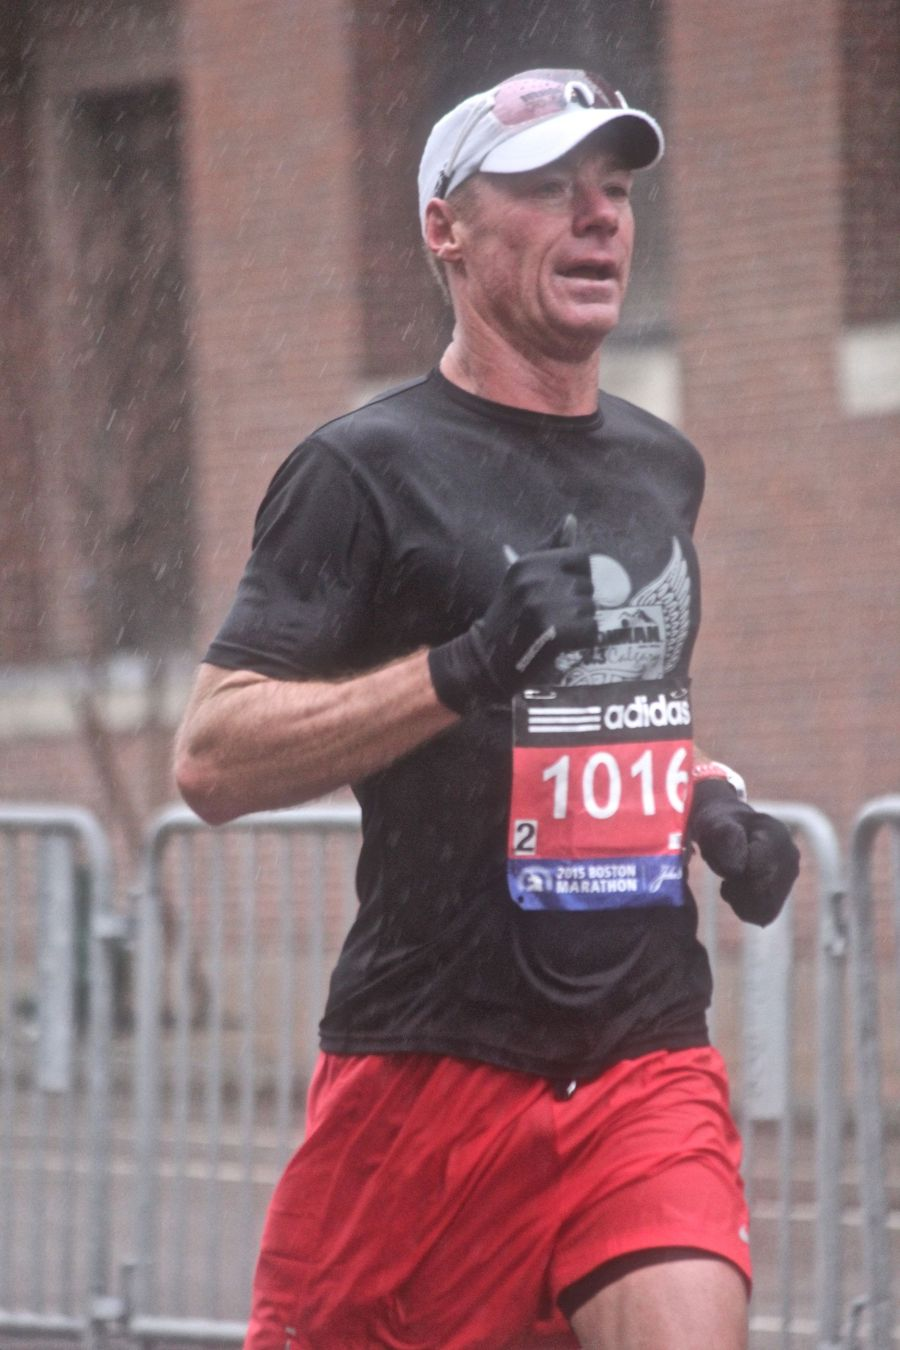 boston marathon april 20 2015 racer number 1016